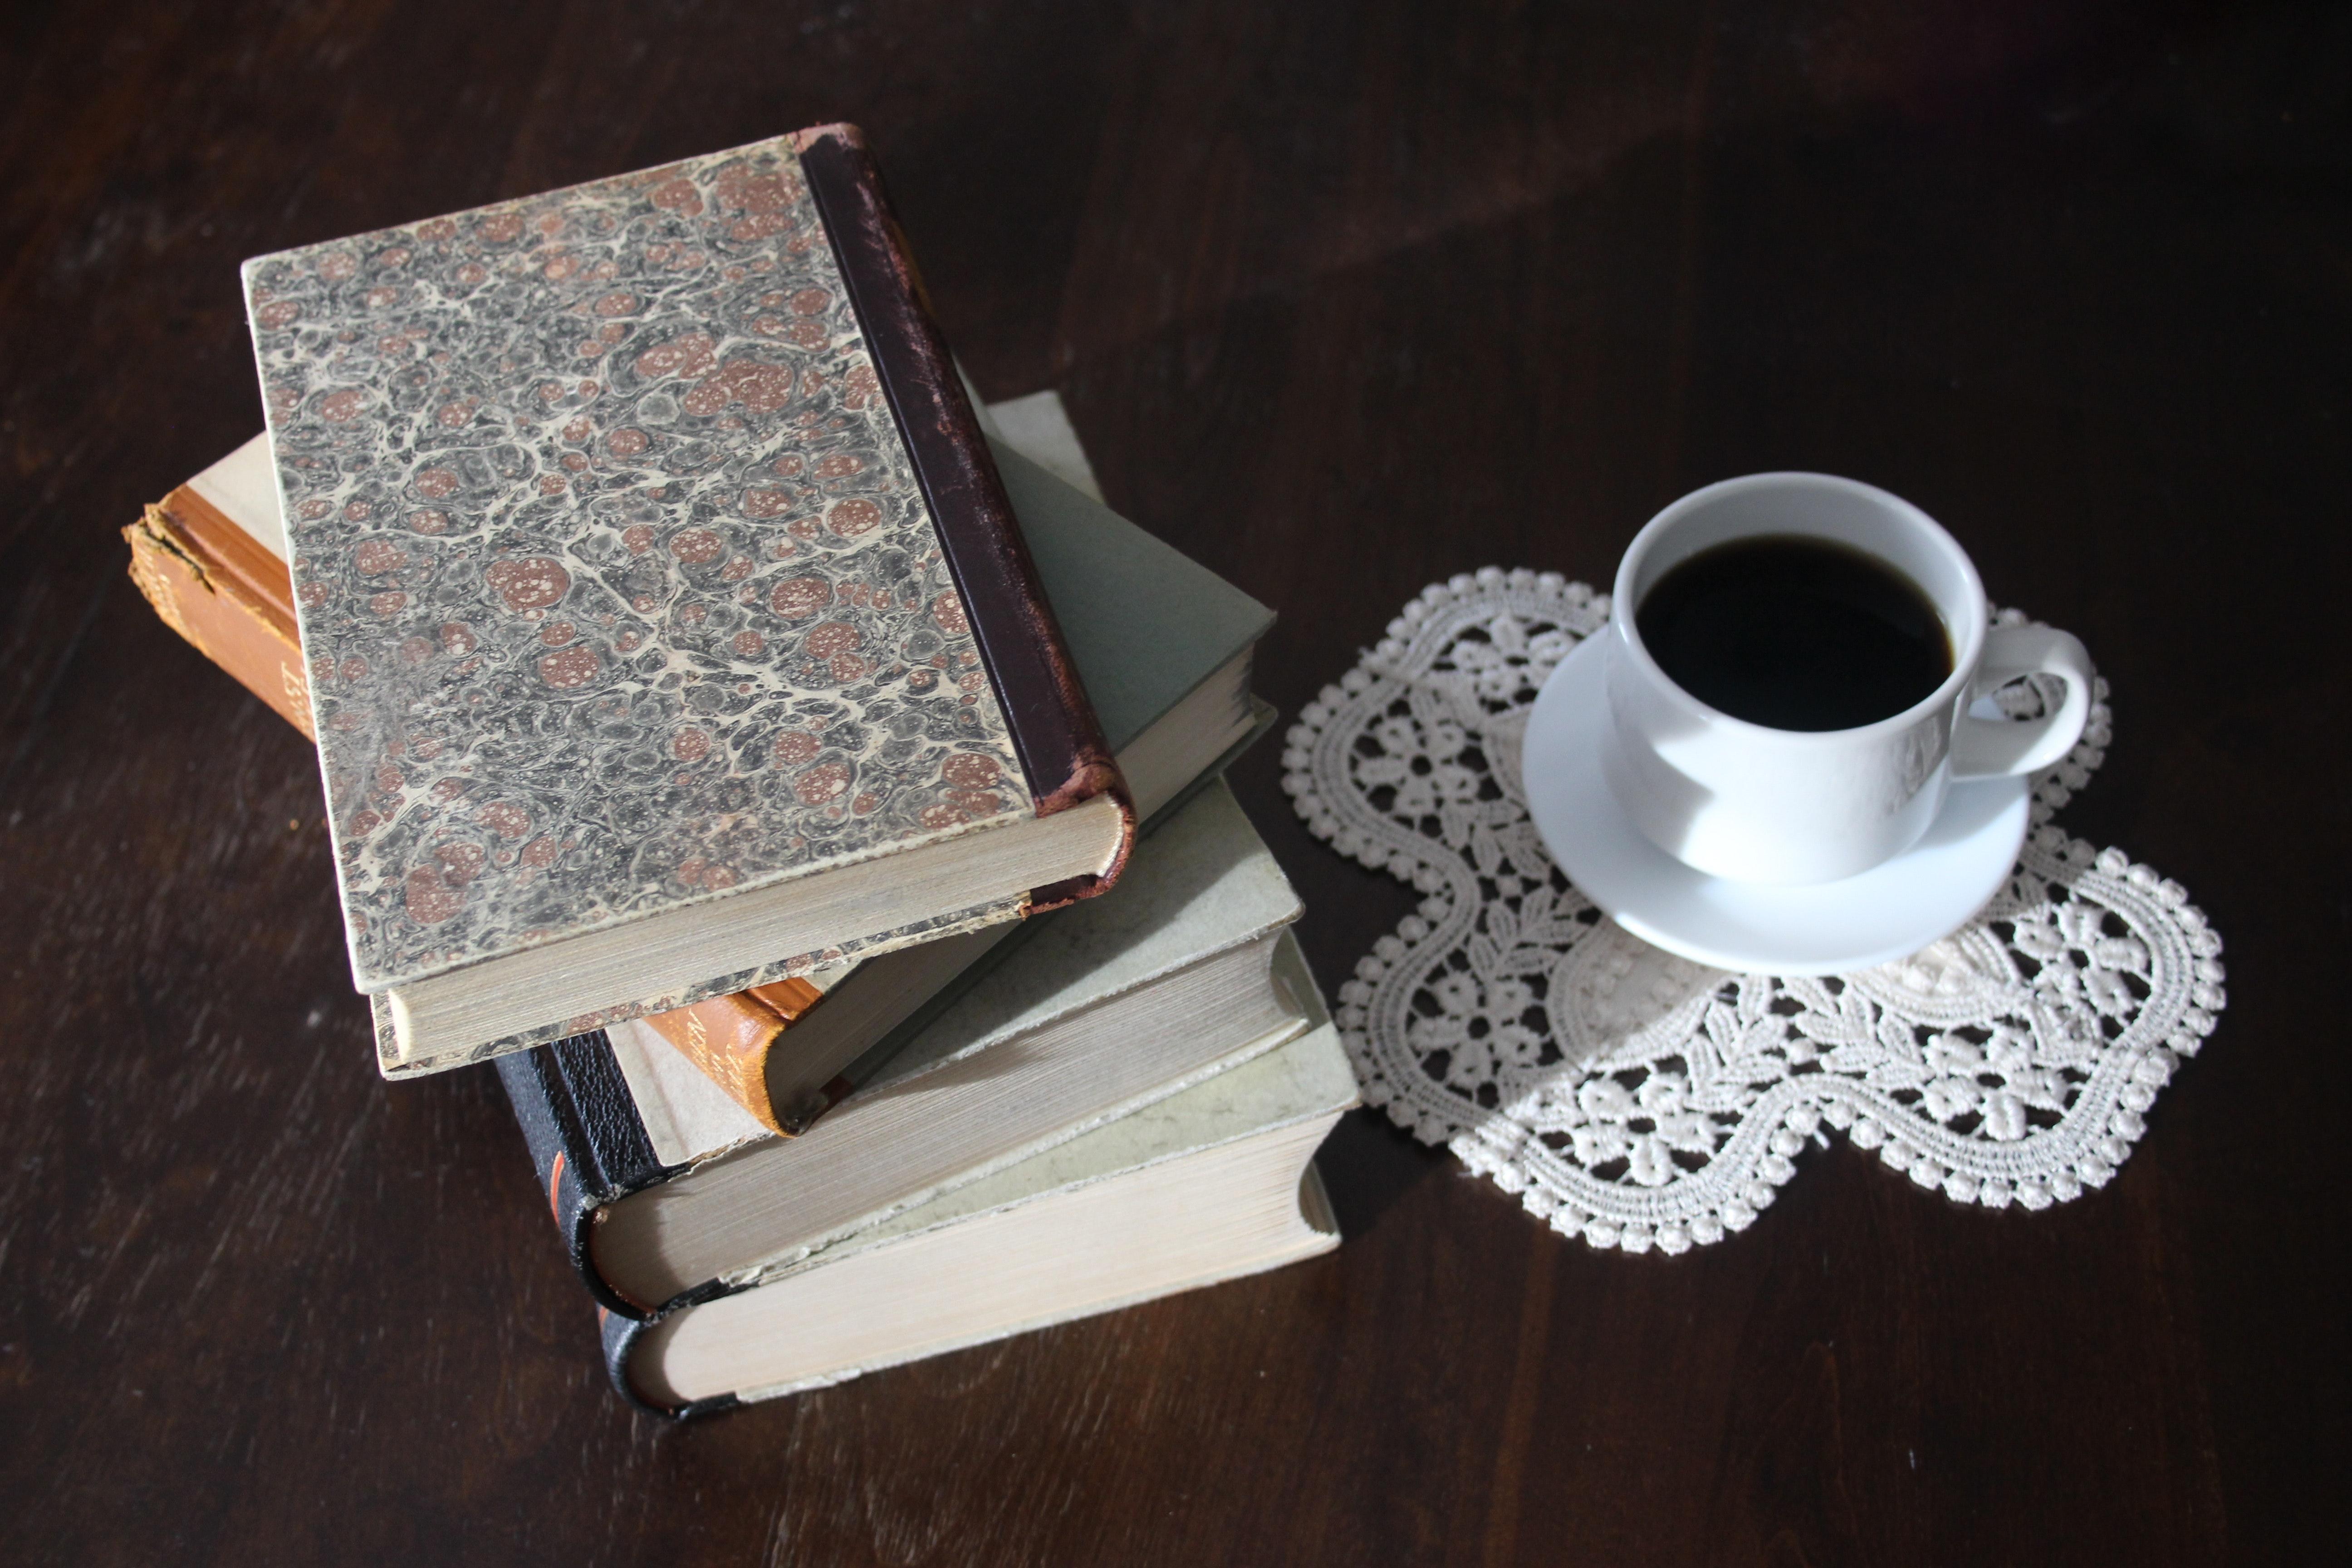 Breakfast Set, Antique, Book, Books, Coffee, HQ Photo